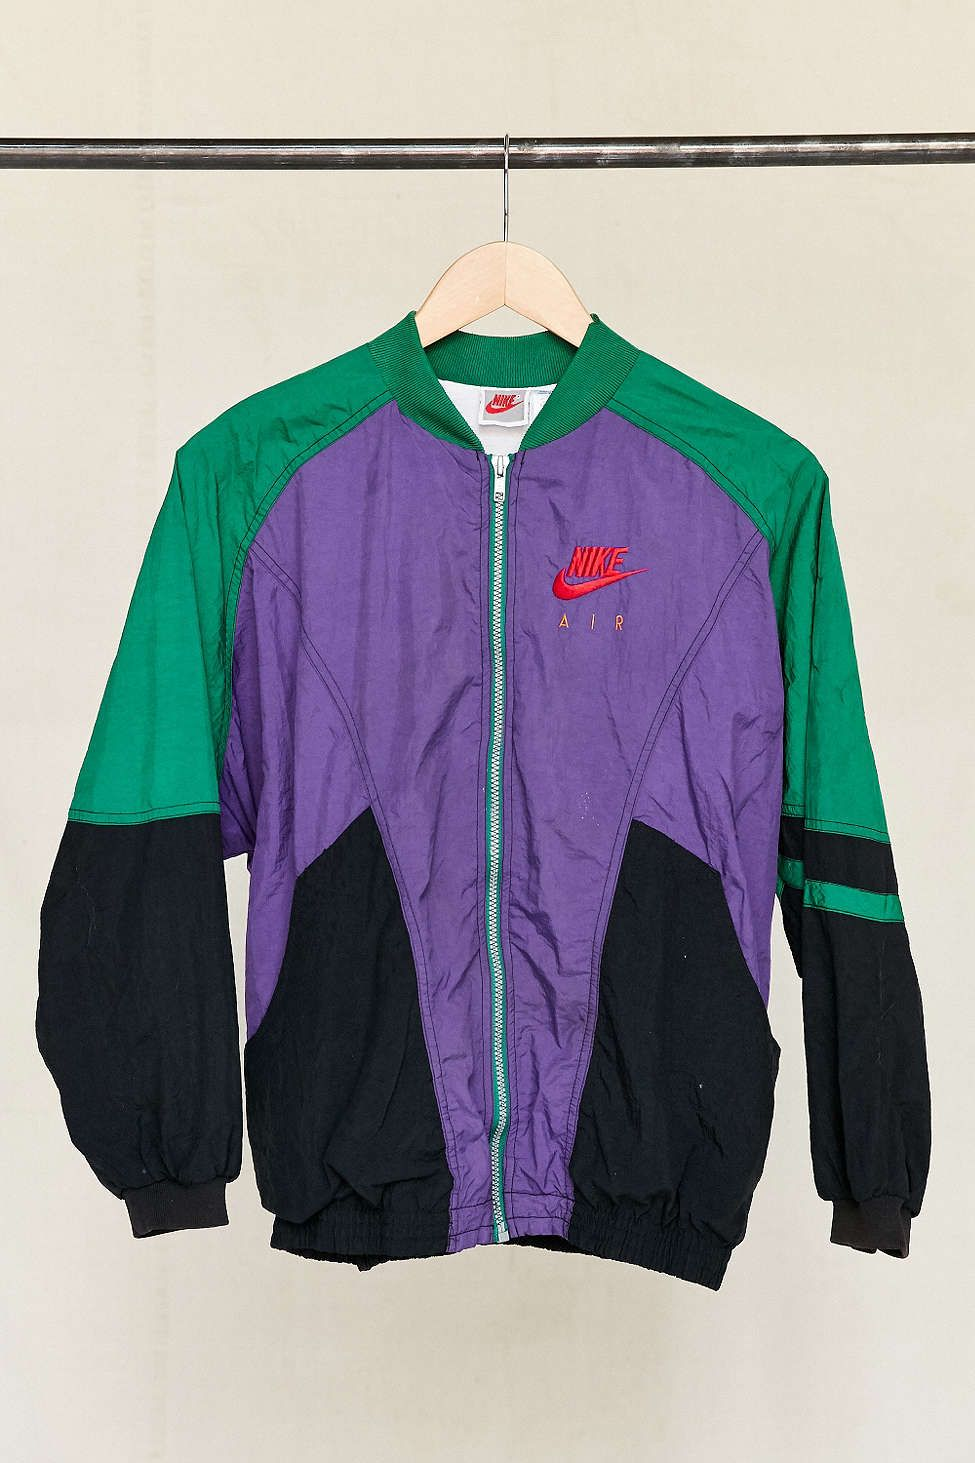 Vintage Nike Air Bomber Jacket Bomber Jacket Vintage Purple Bomber Jacket Vintage Nike [ 1463 x 975 Pixel ]